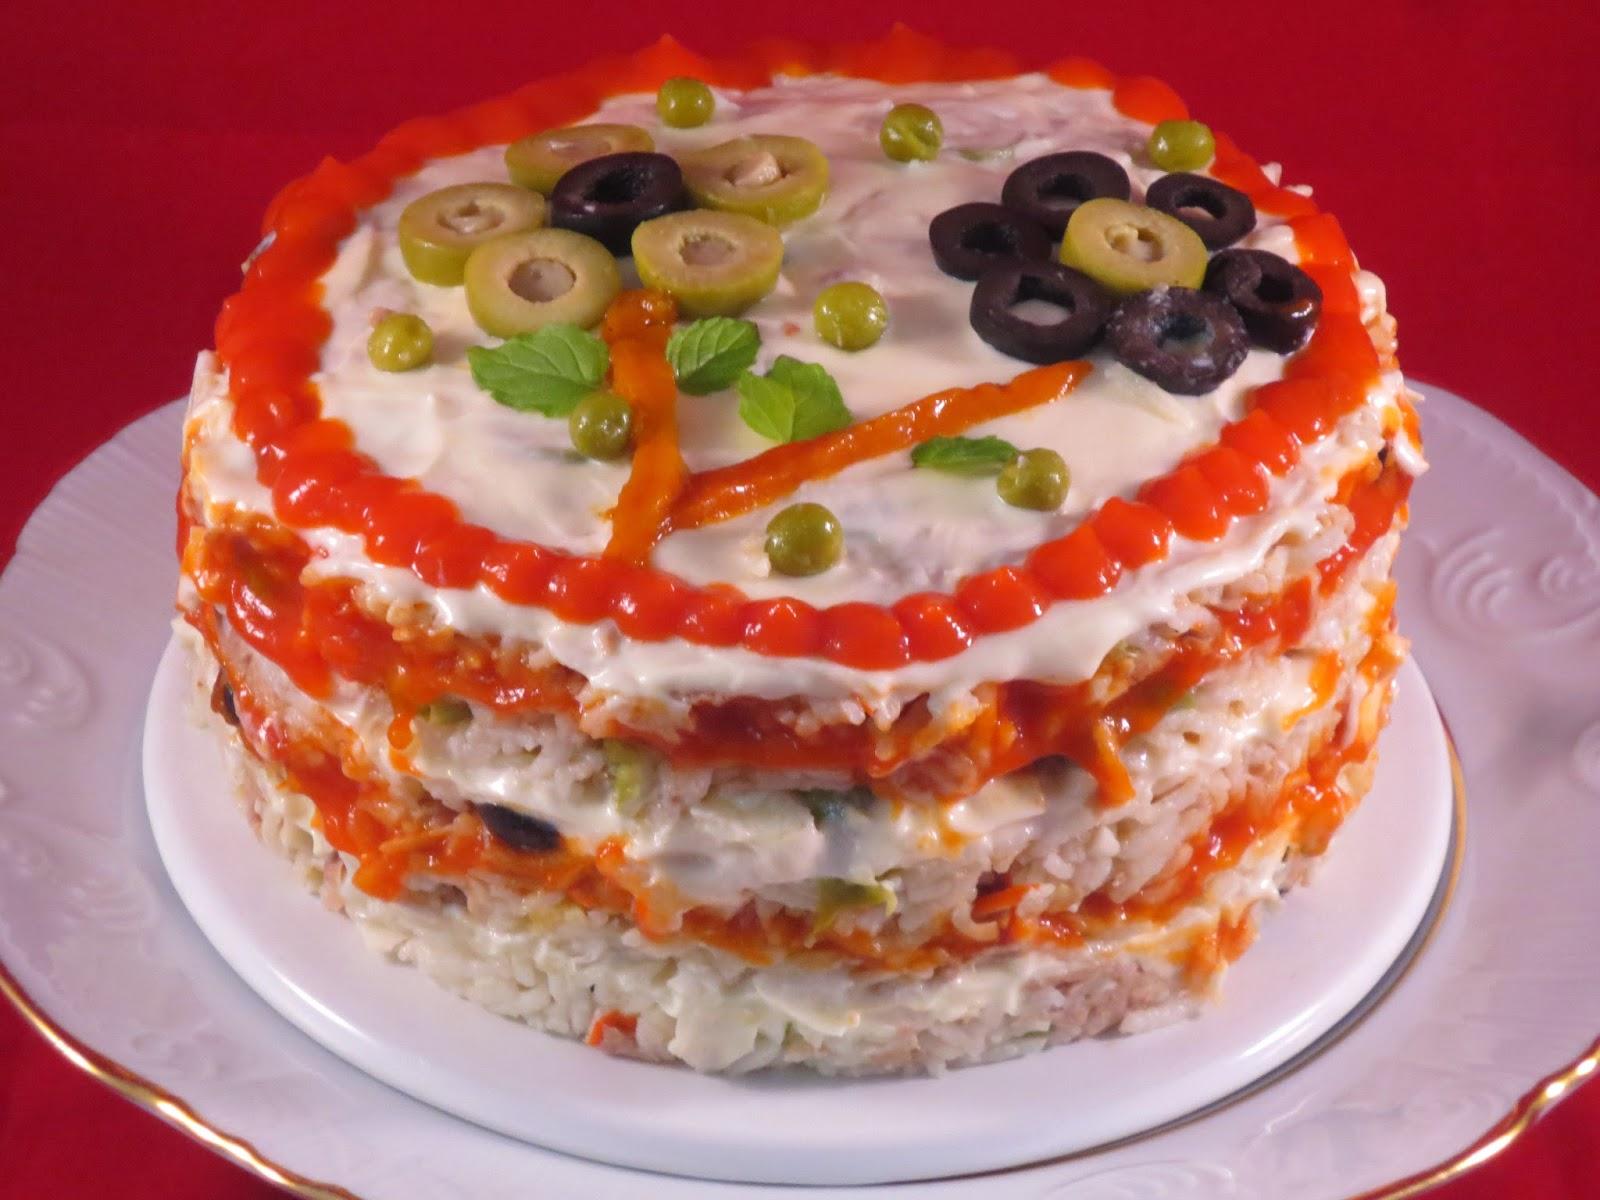 Pastel de ensalada de arroz